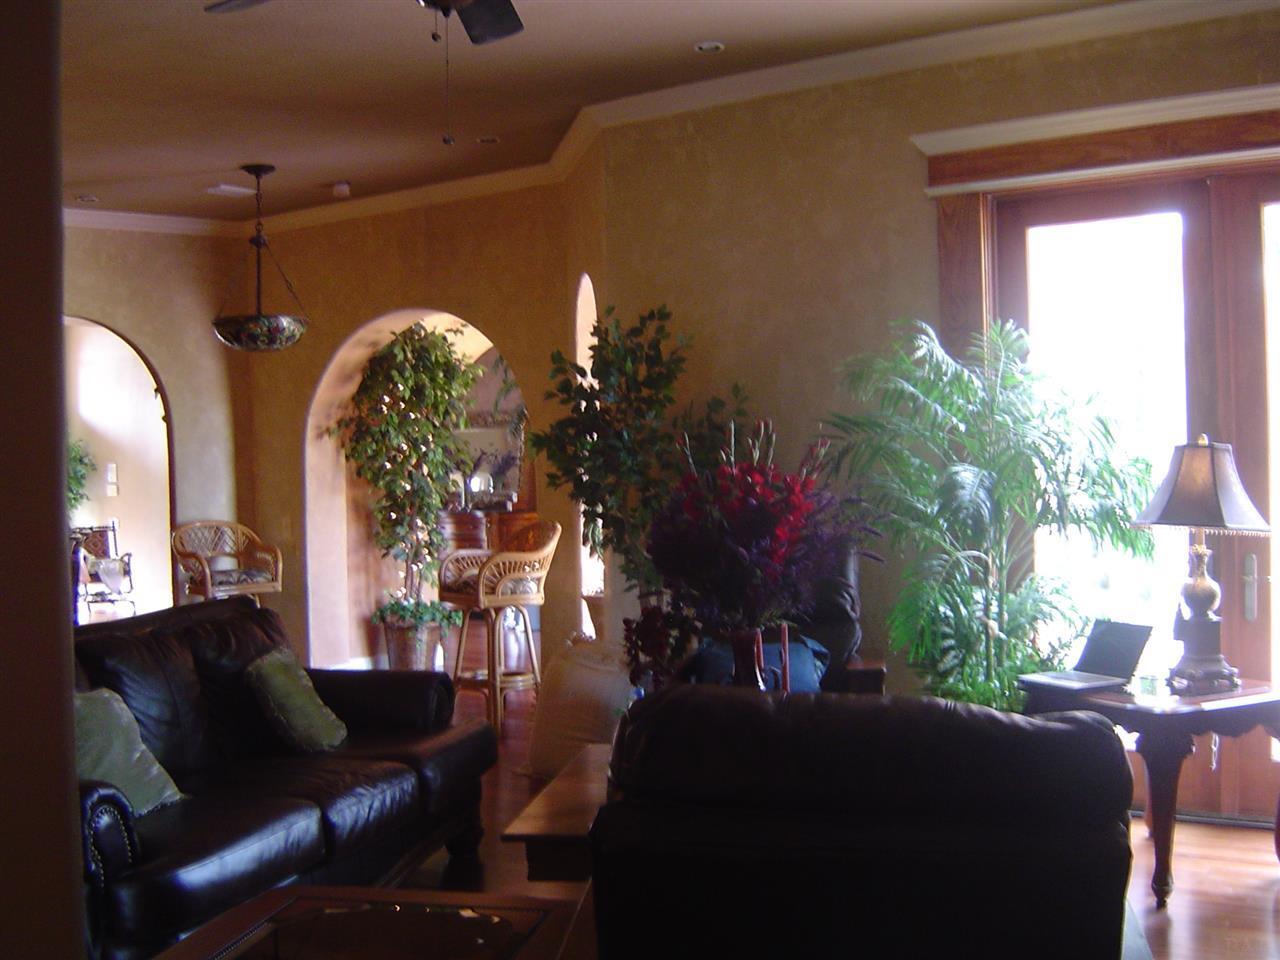 5121 High Pointe Dr, Pensacola, FL 32505